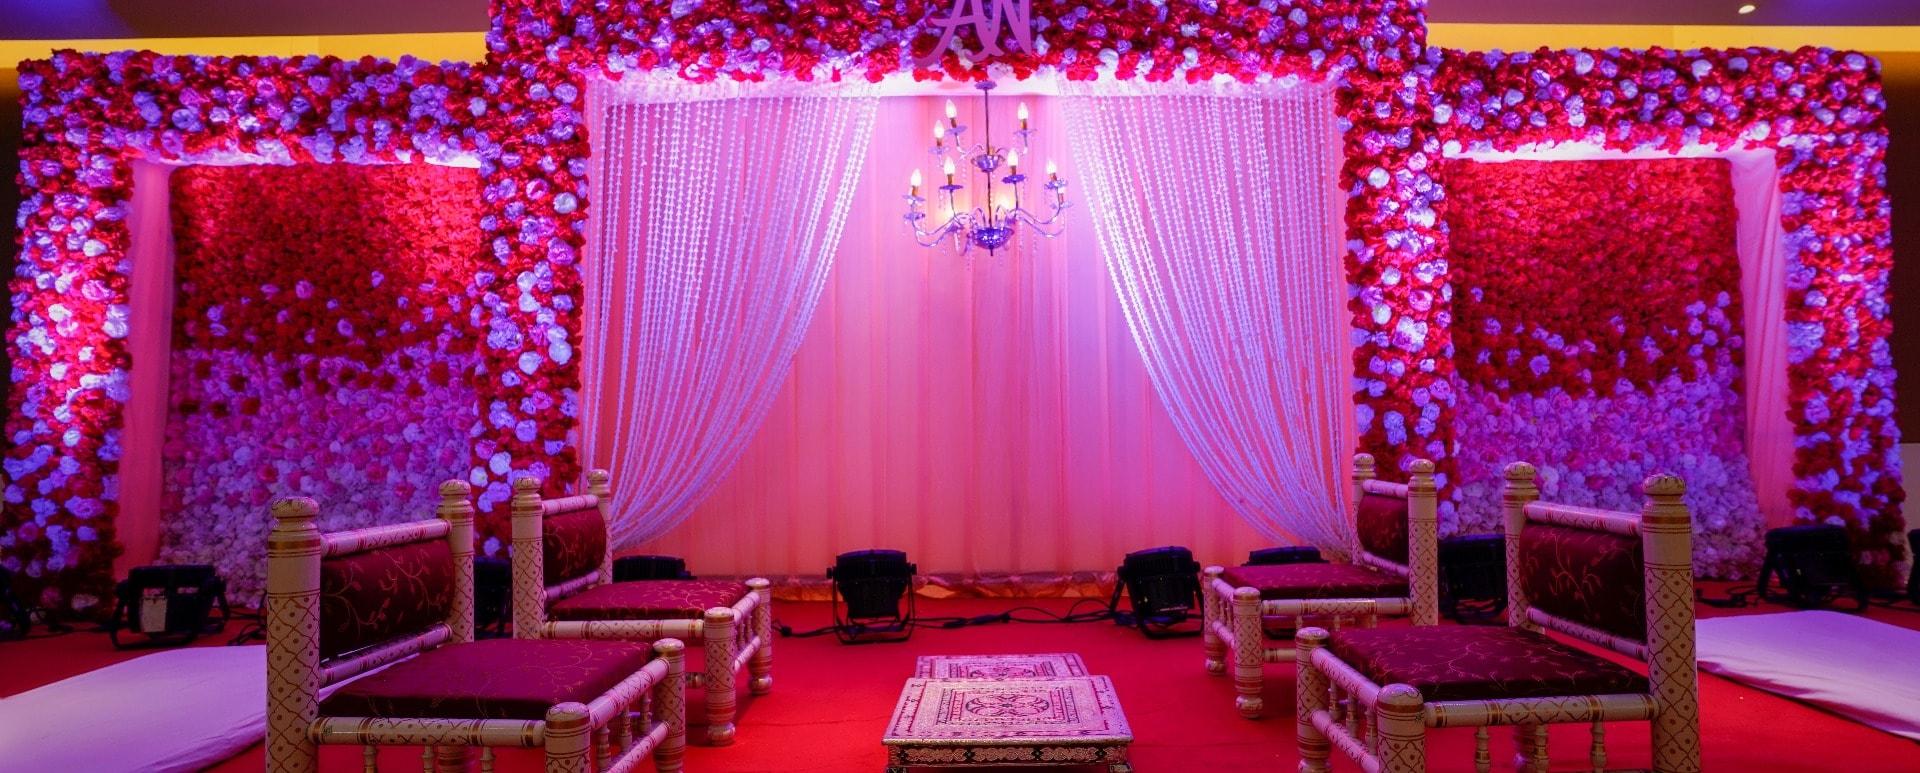 Sanyog Events - Event Planner and Organizer in Sawai Madhopur HO, Sawai Madhopur